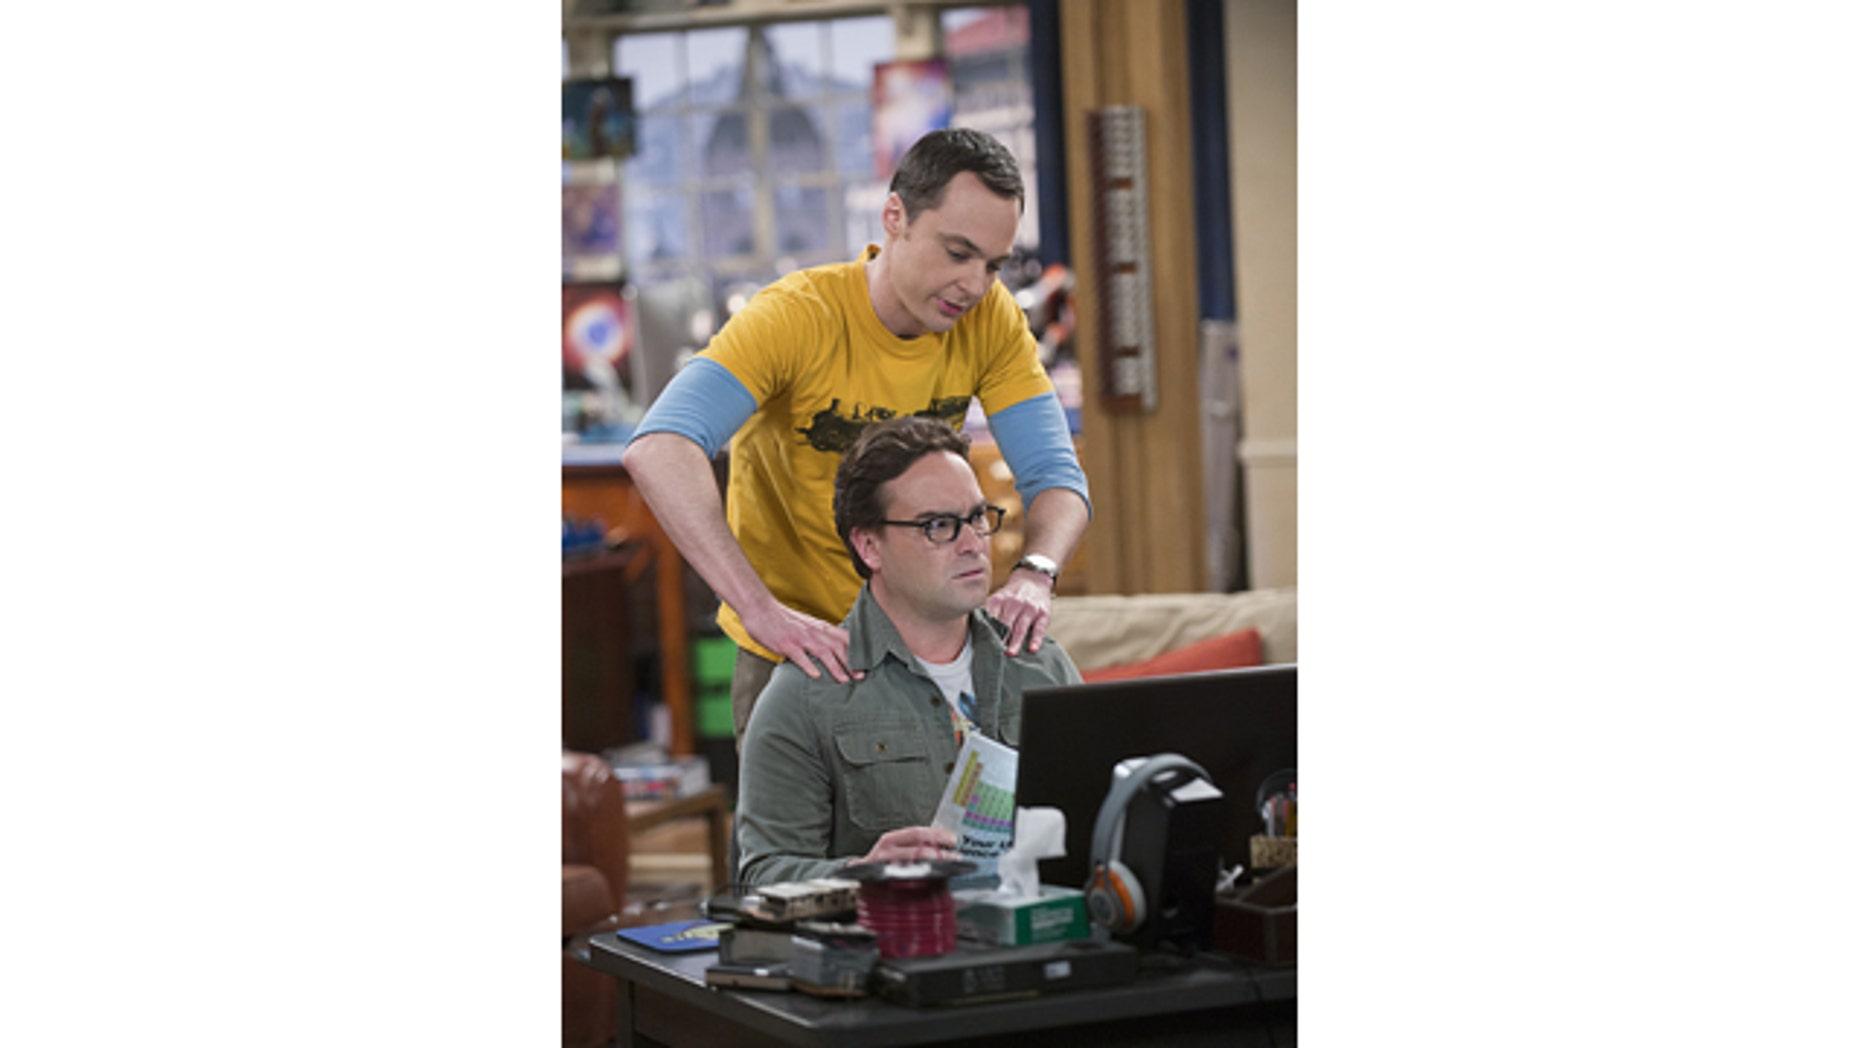 Johnny Galecki and Jim Parsons play Leonard and Sheldon on 'The Big Bang Theory' (Neil Jacobs/CBS)